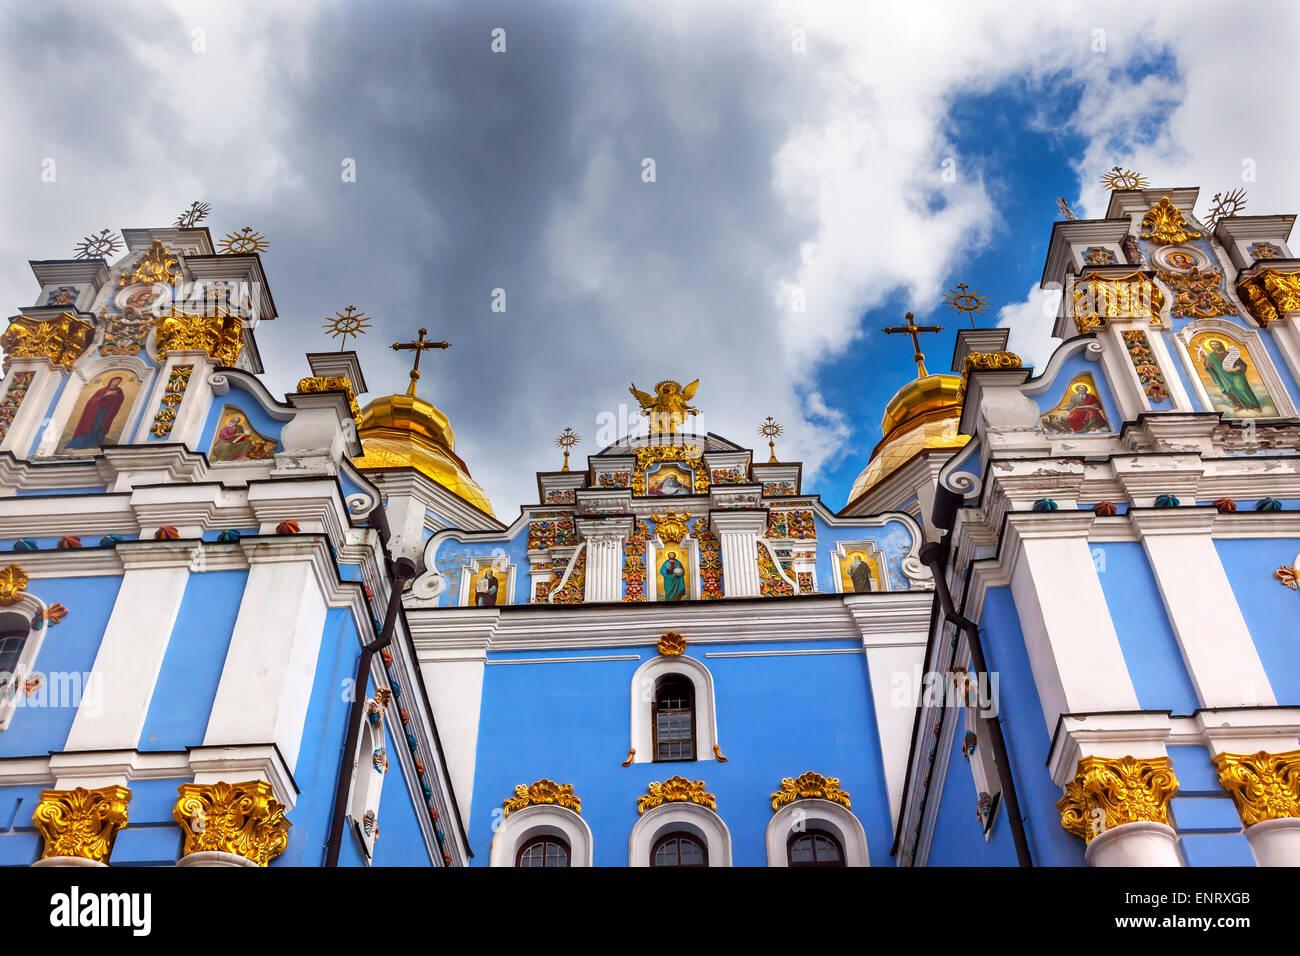 Saint Michael Monastery Cathedral Steeples Spires Facade Kiev Ukraine. - Stock Image